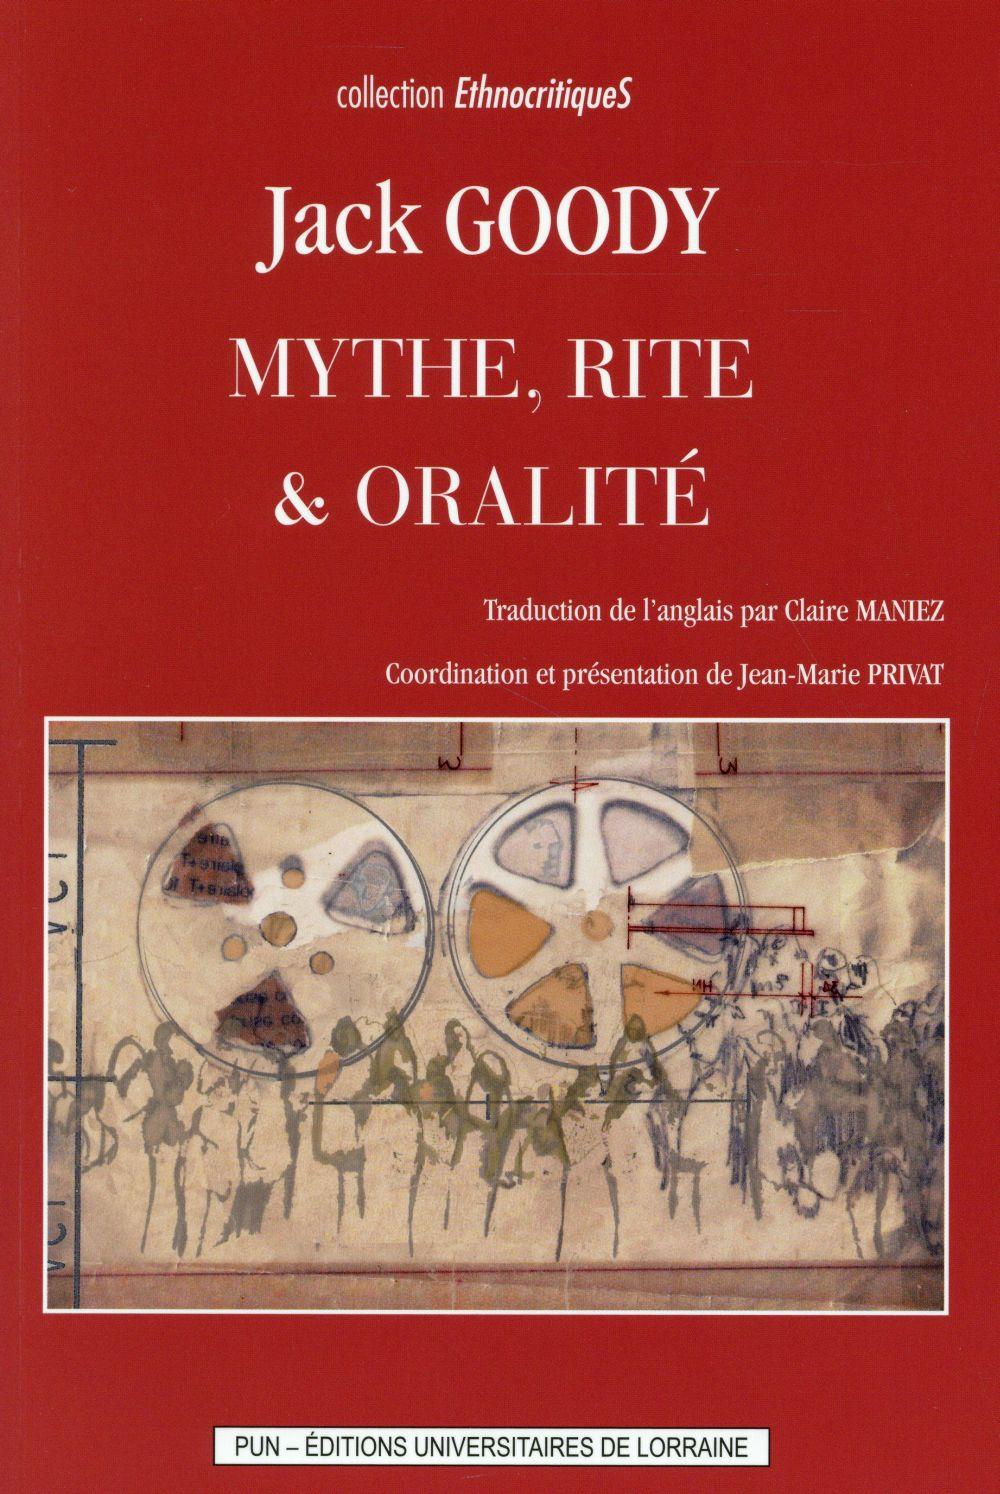 mythe, rite & oralite